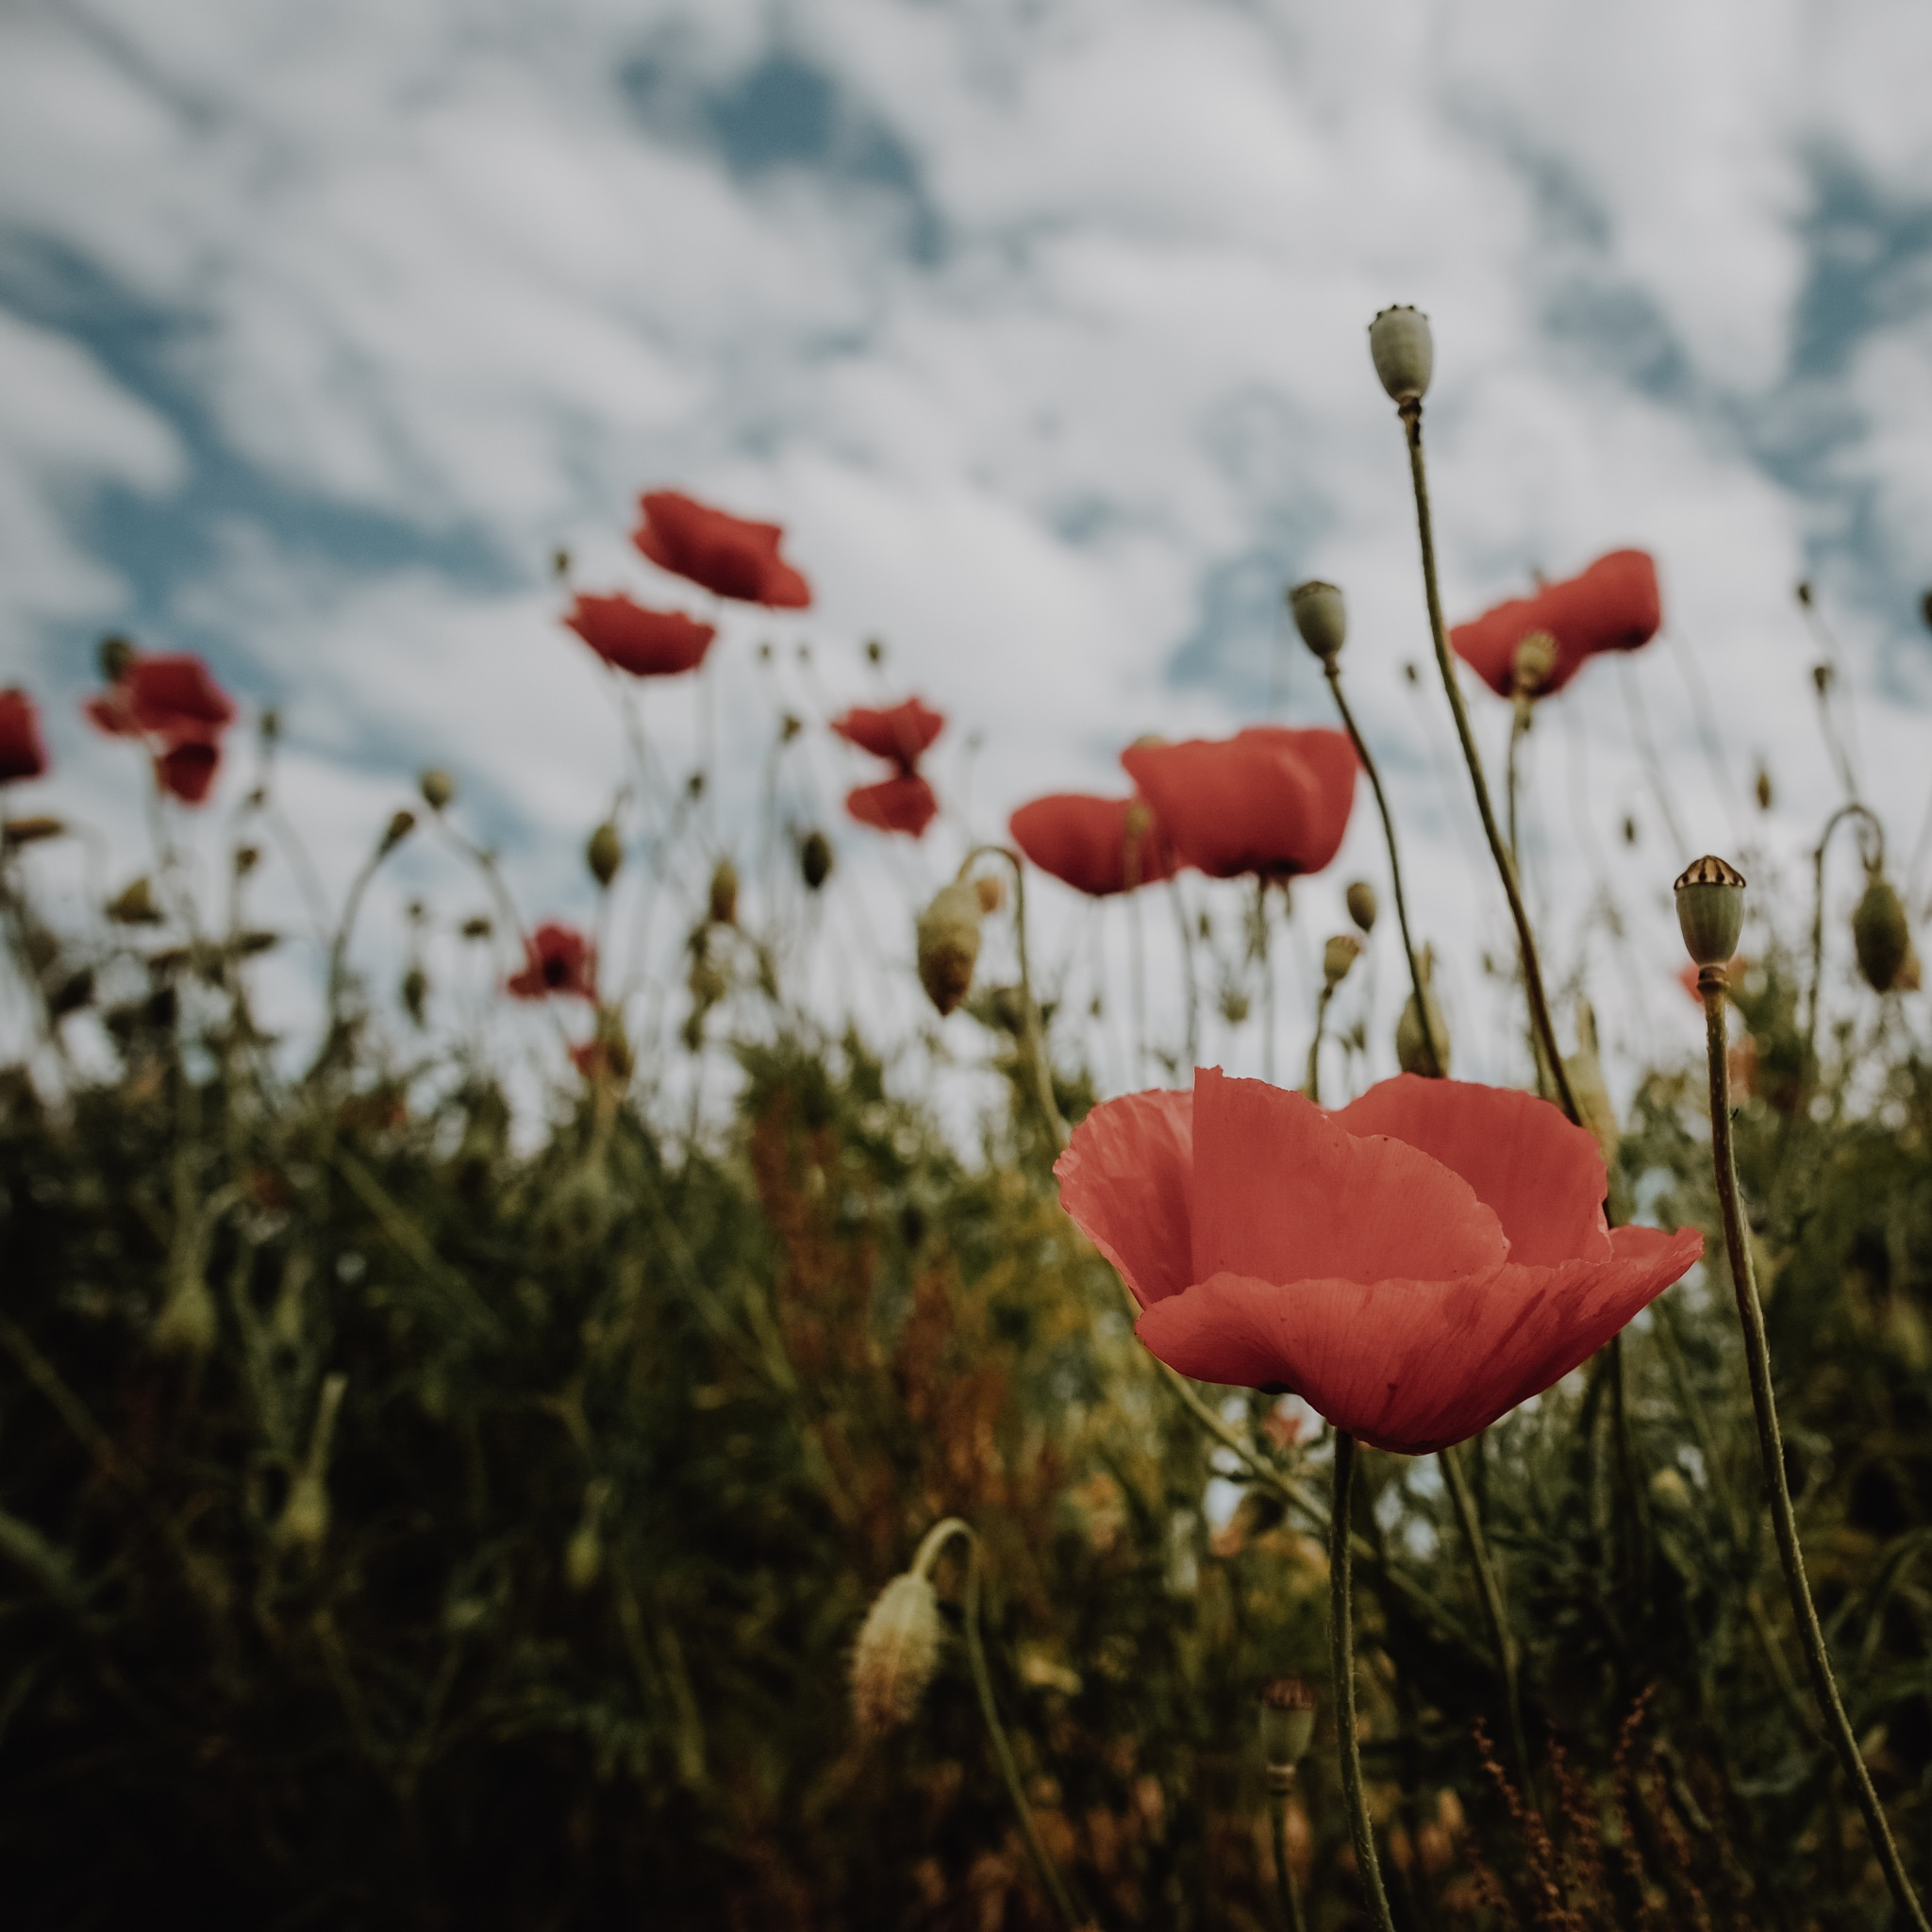 Poppy by MirrorlessFocus